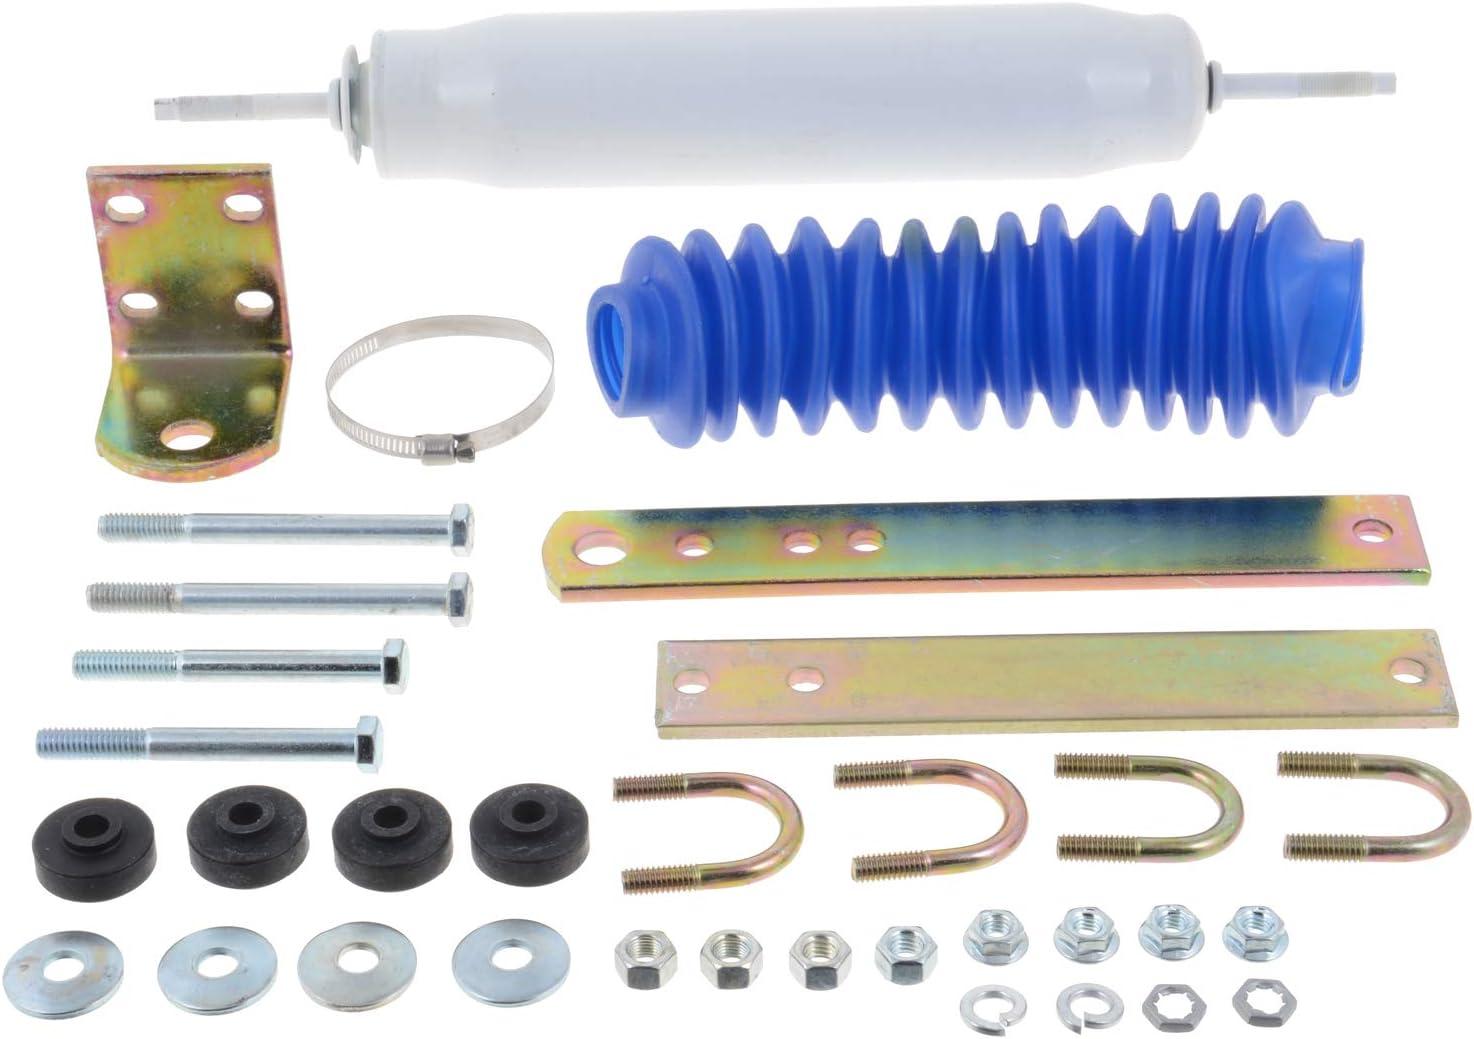 TRW JSD109 Steering Damper